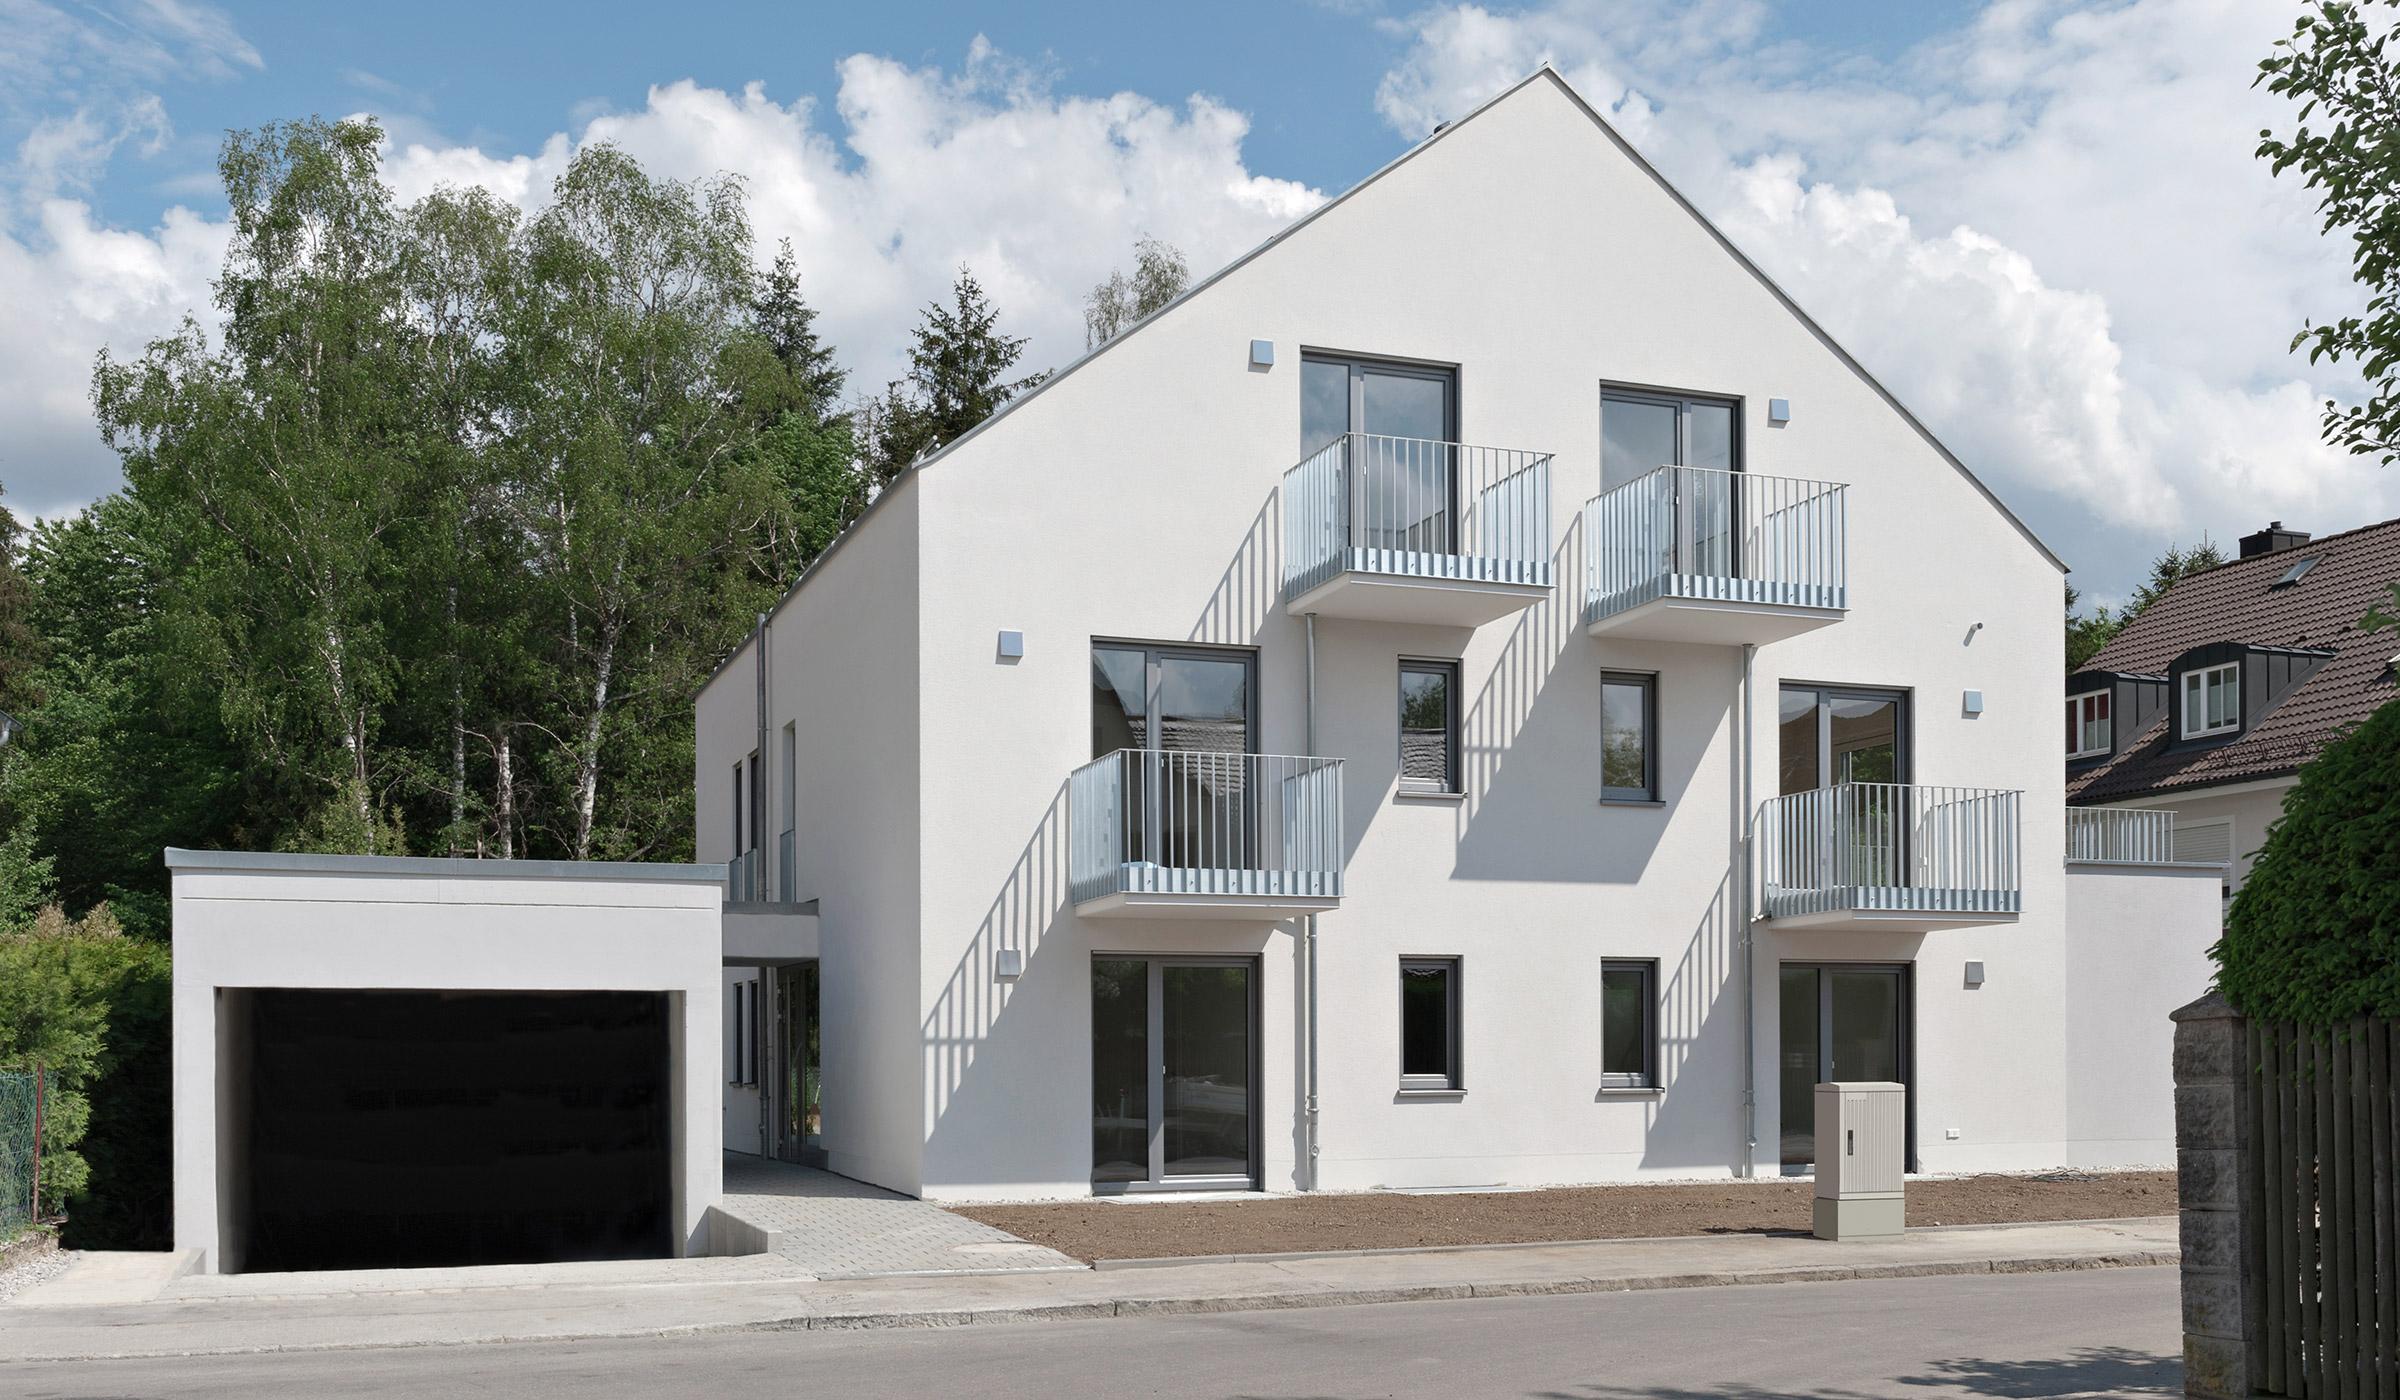 3BAU-Referenz-Heimdall-Neubau-Mehrfamilienhaus-Waldperlach-2